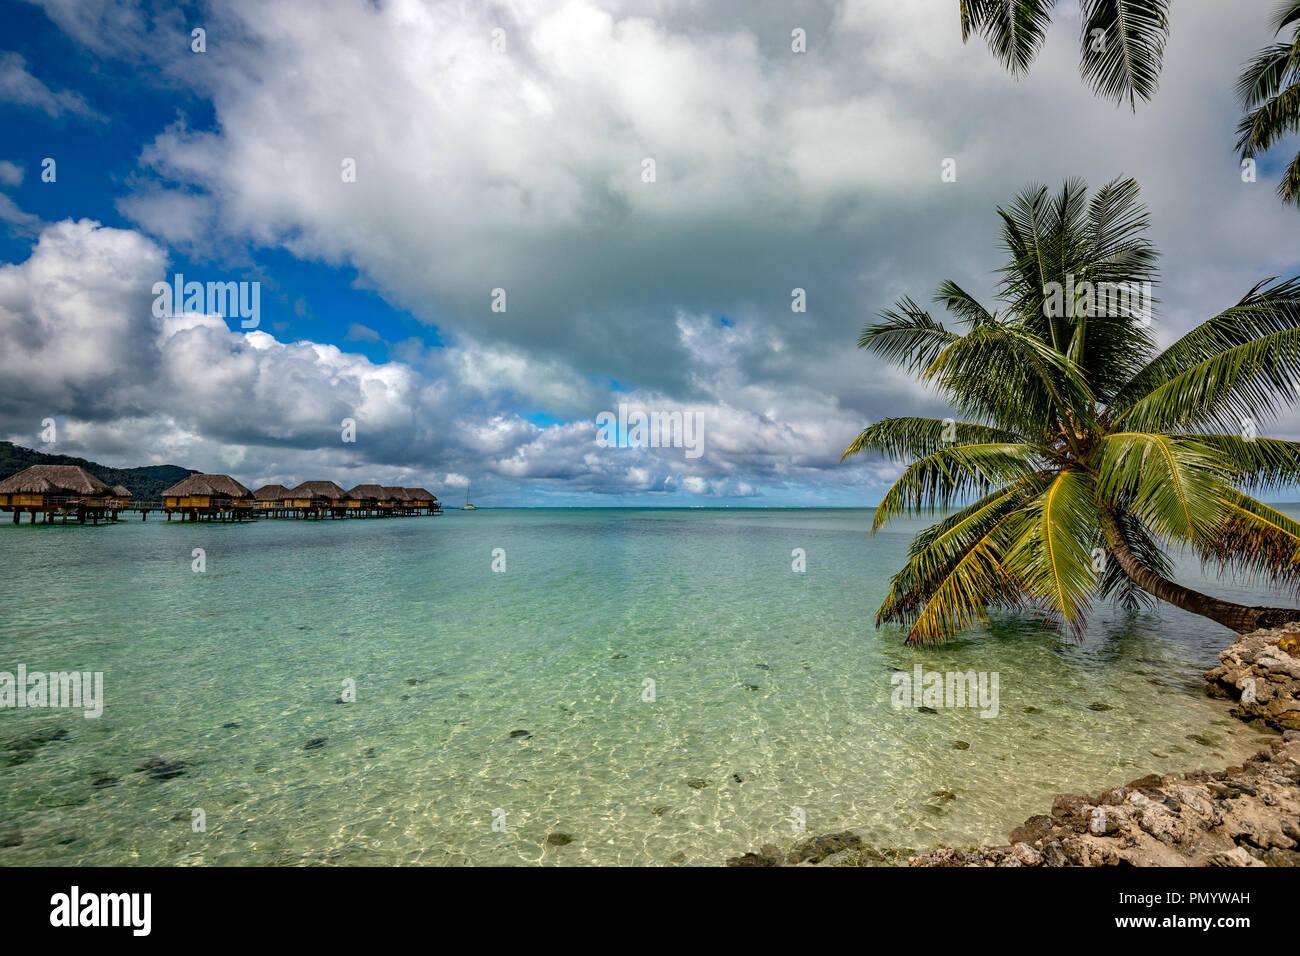 14c48762e0 Isola di bora bora Polinesia francese antenna vista aereo panorama  paesaggio, bungalow Overwater Immagini Stock